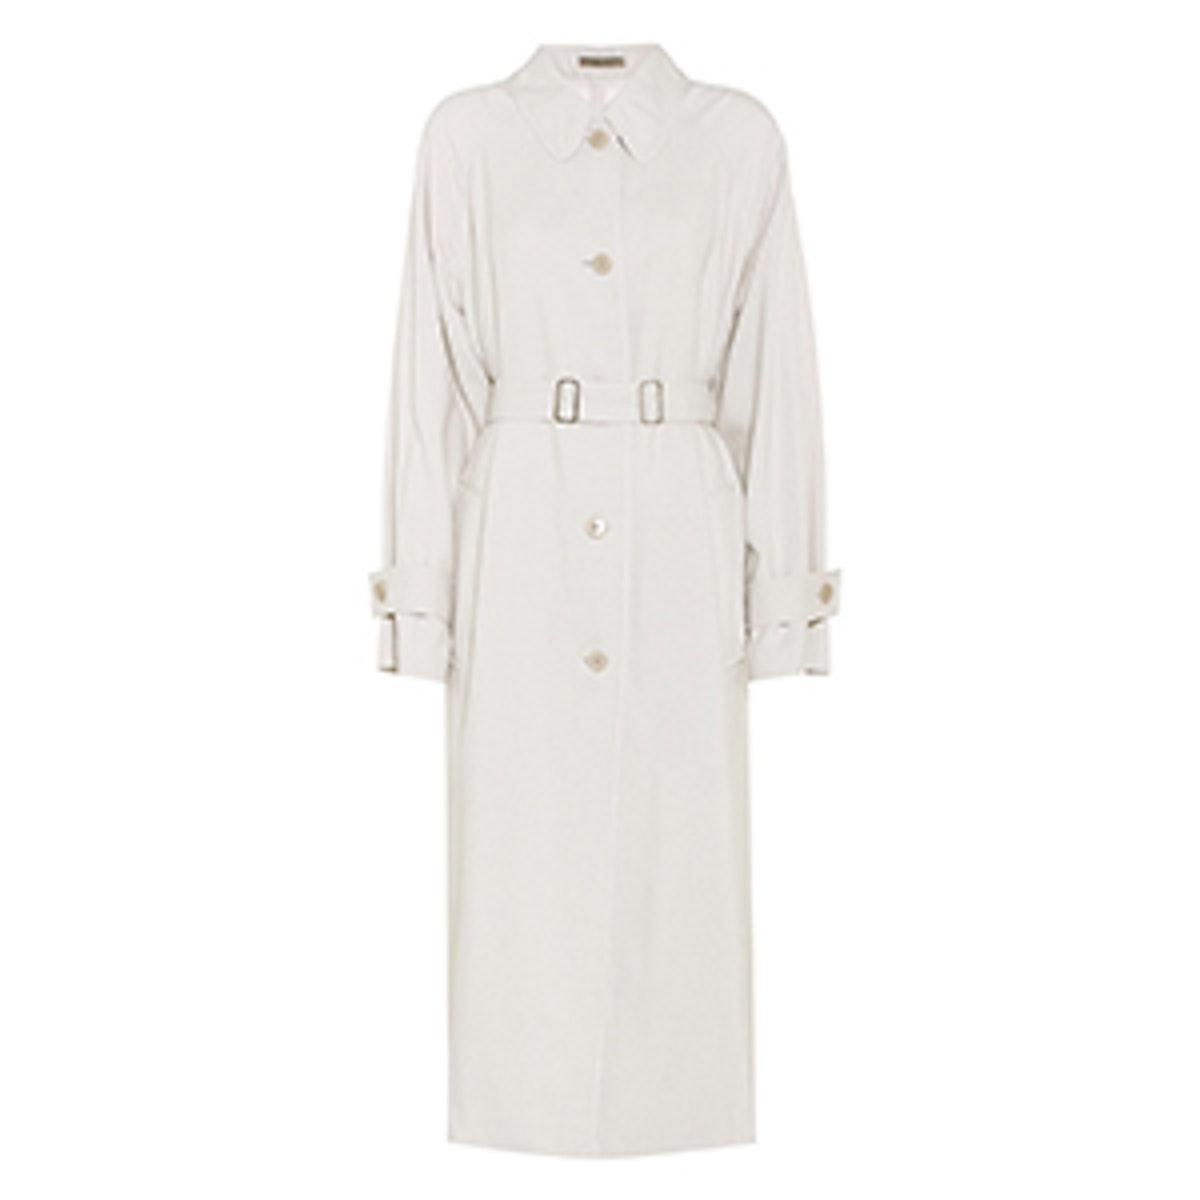 Coat In Mist Fluid Silk